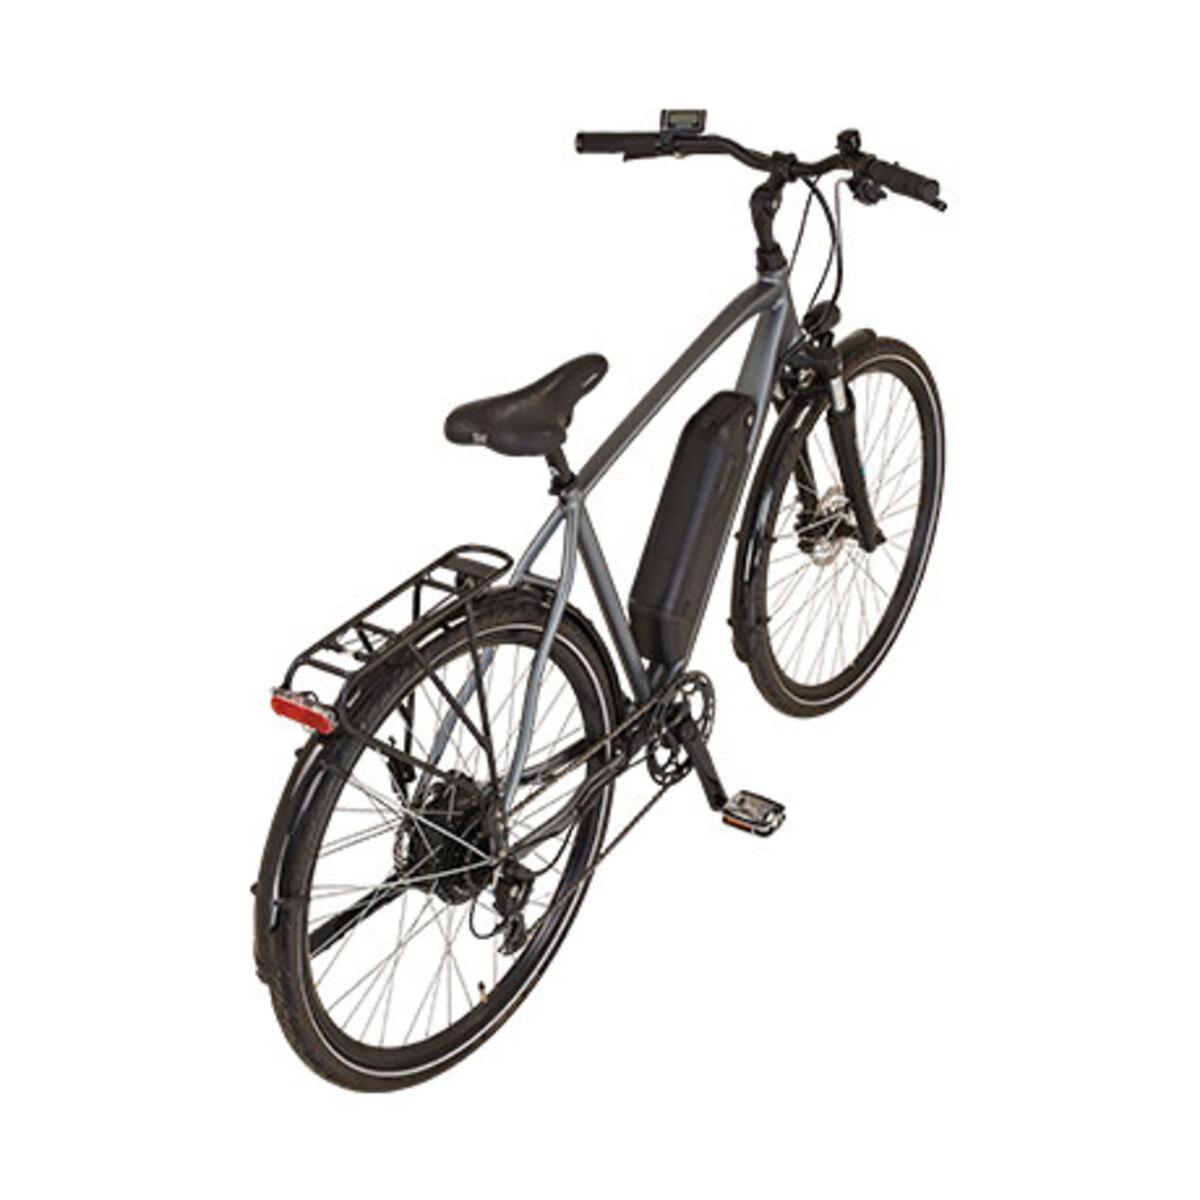 Bild 3 von Prophete Trekking-E-Bike Herren